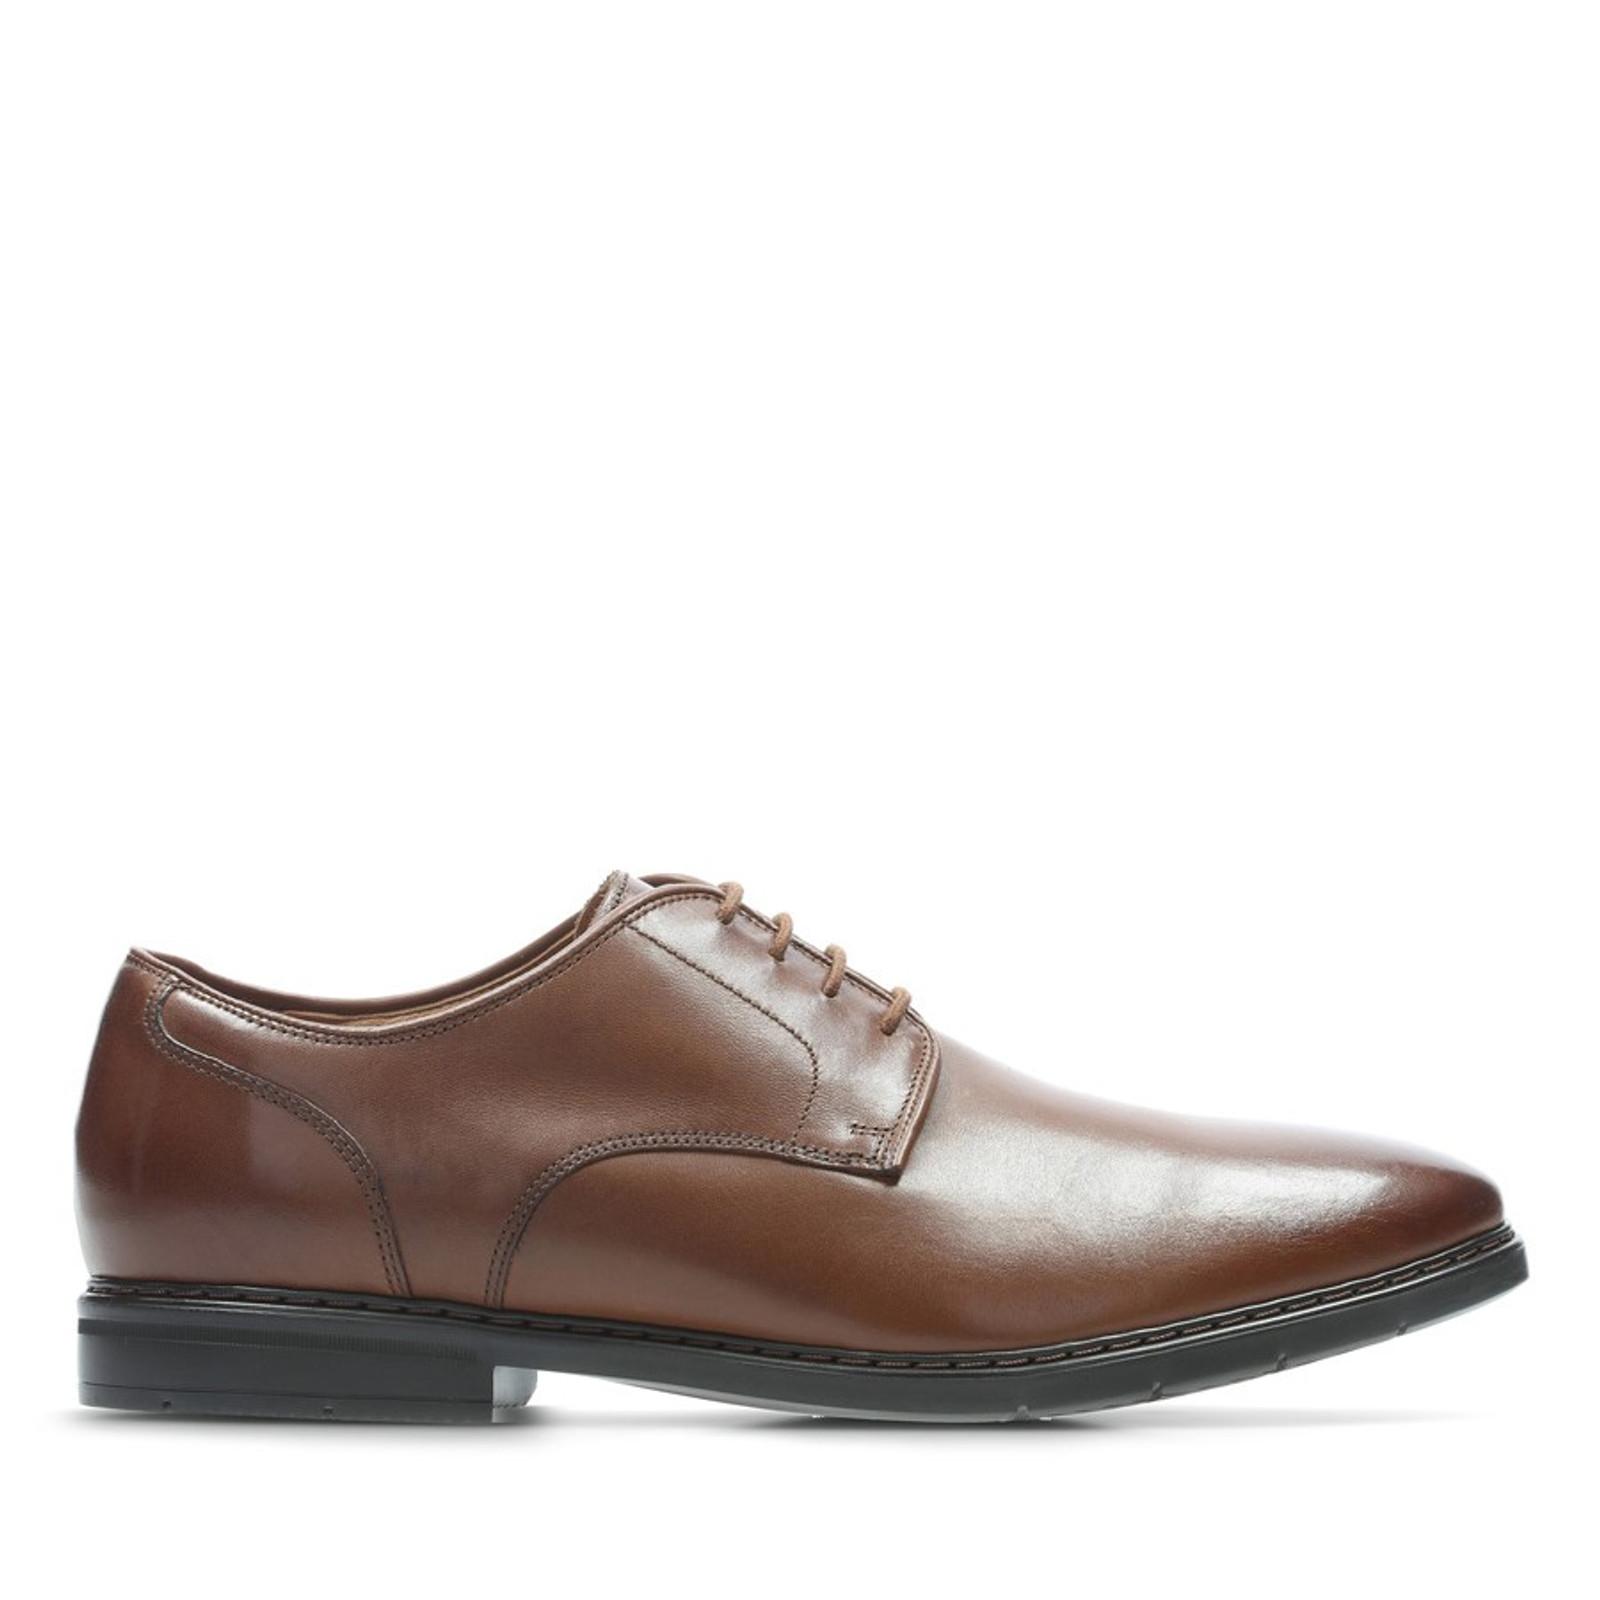 Clarks Mens BANBURY LACE British Tan Leather